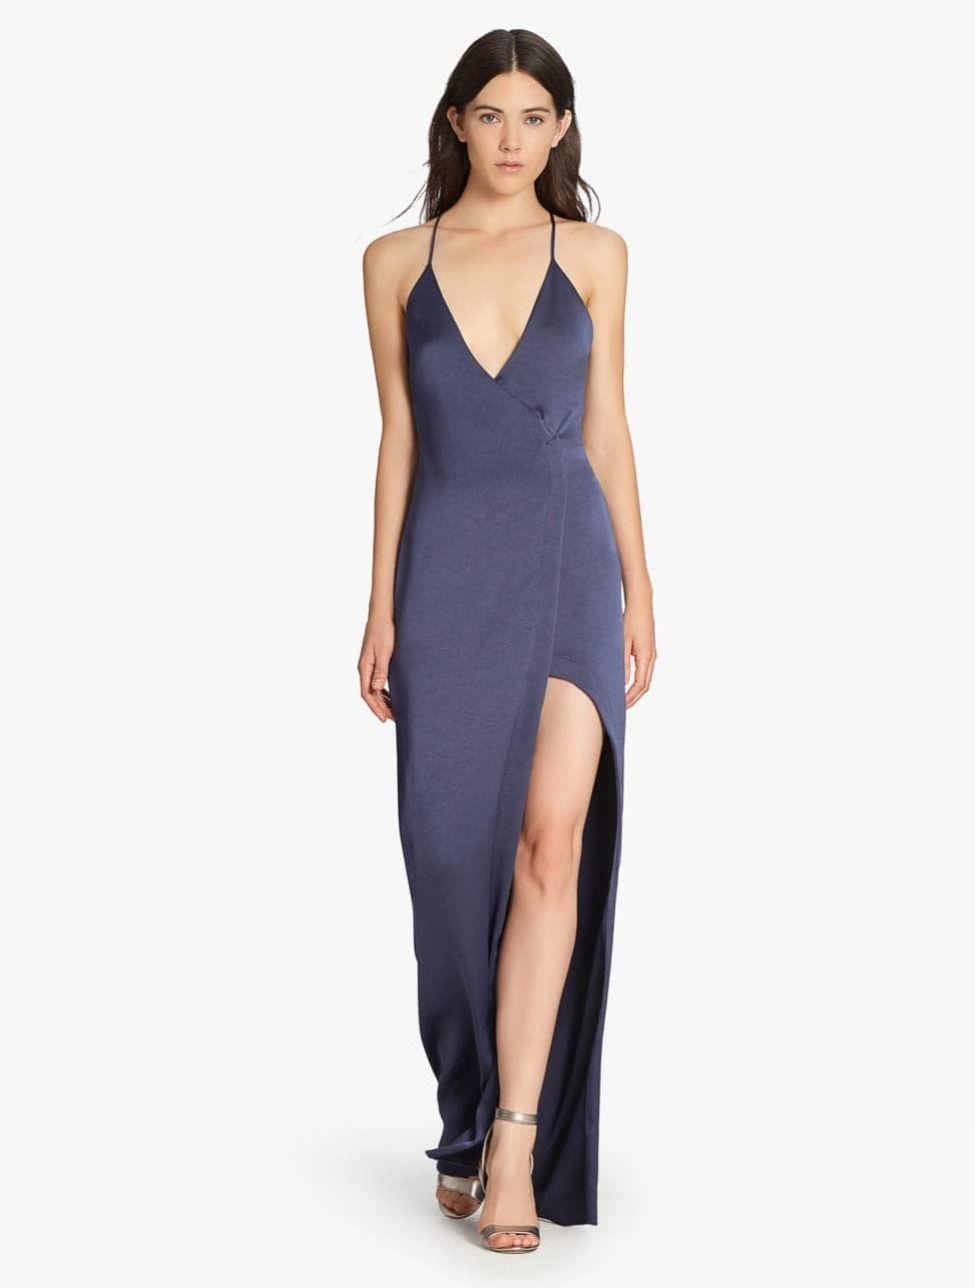 Satin Slip Gown   Bridesmaids   Pinterest   Satin slip, Gowns and Satin